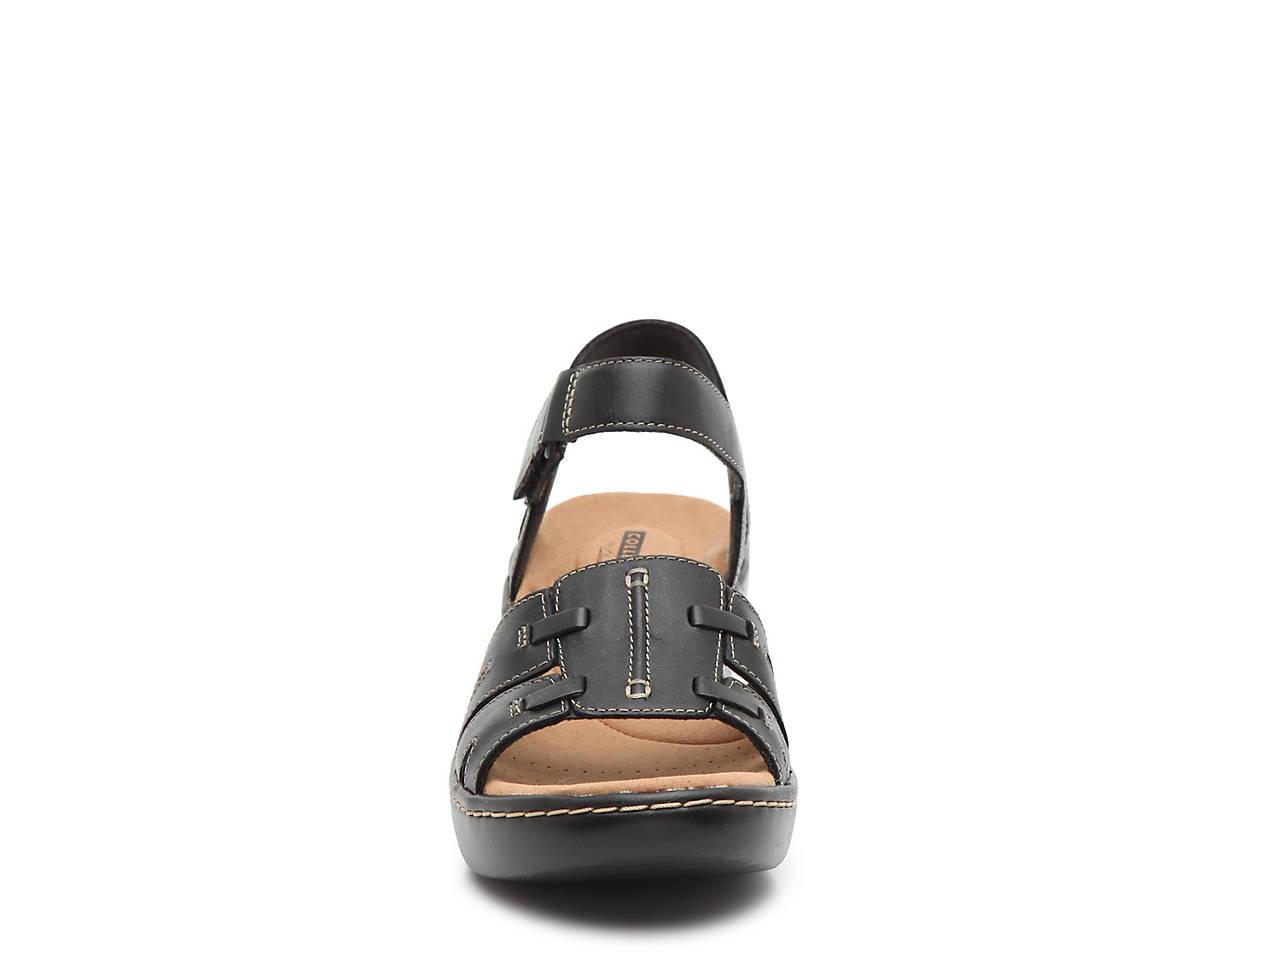 87d004001b27 Home · Women s Shoes · Sandals  Delana Nila Wedge Sandal. previous